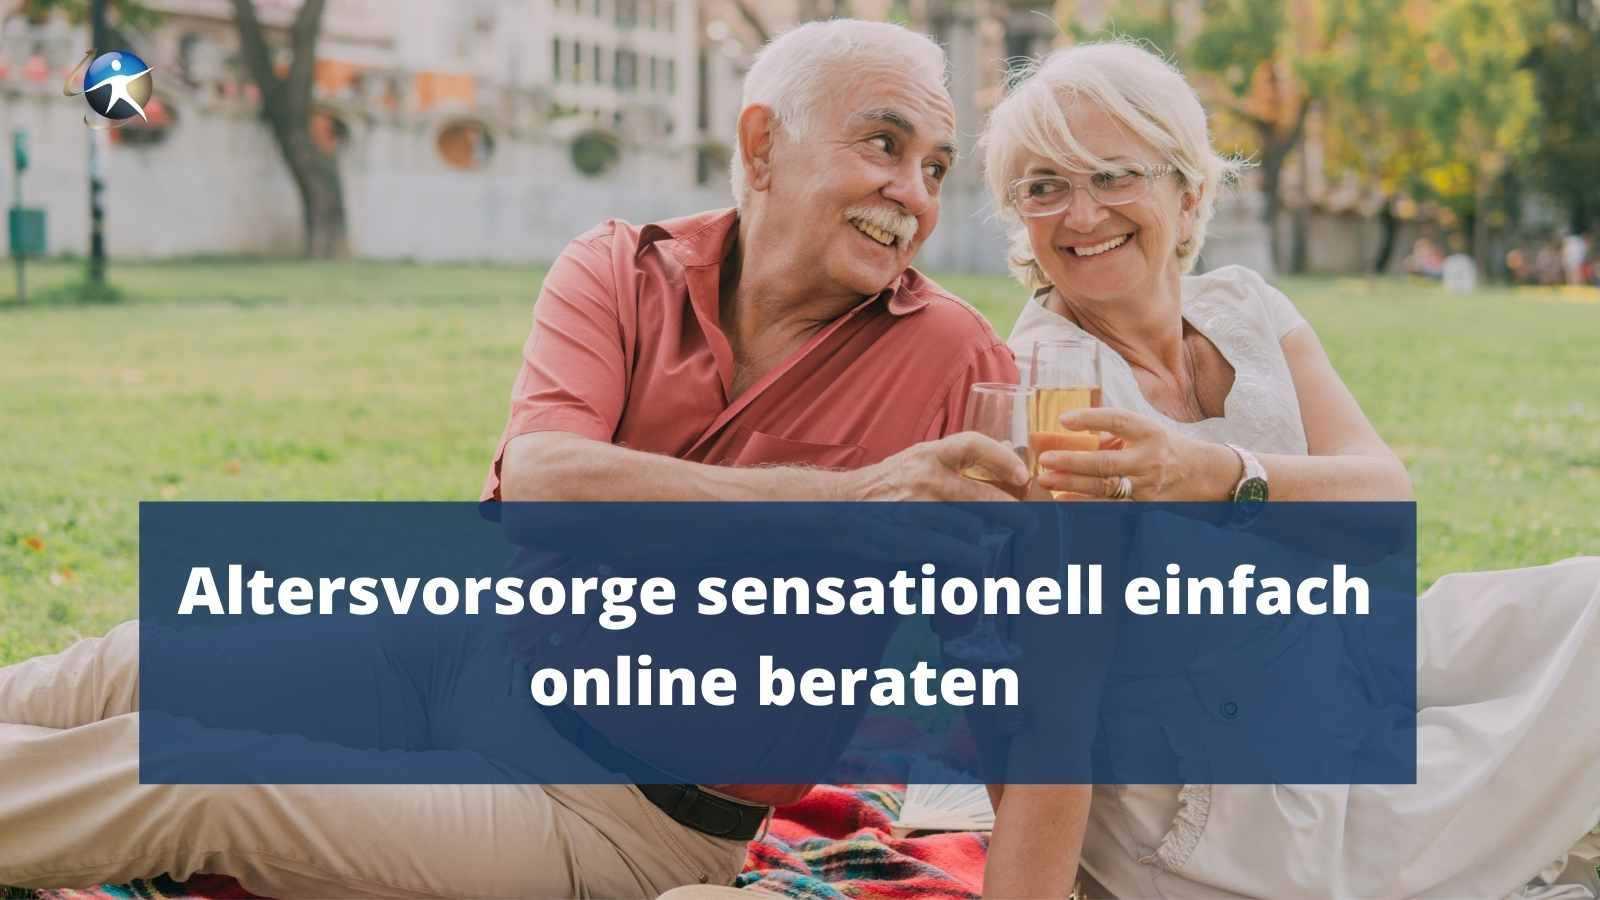 Altersvorsorge_online beraten